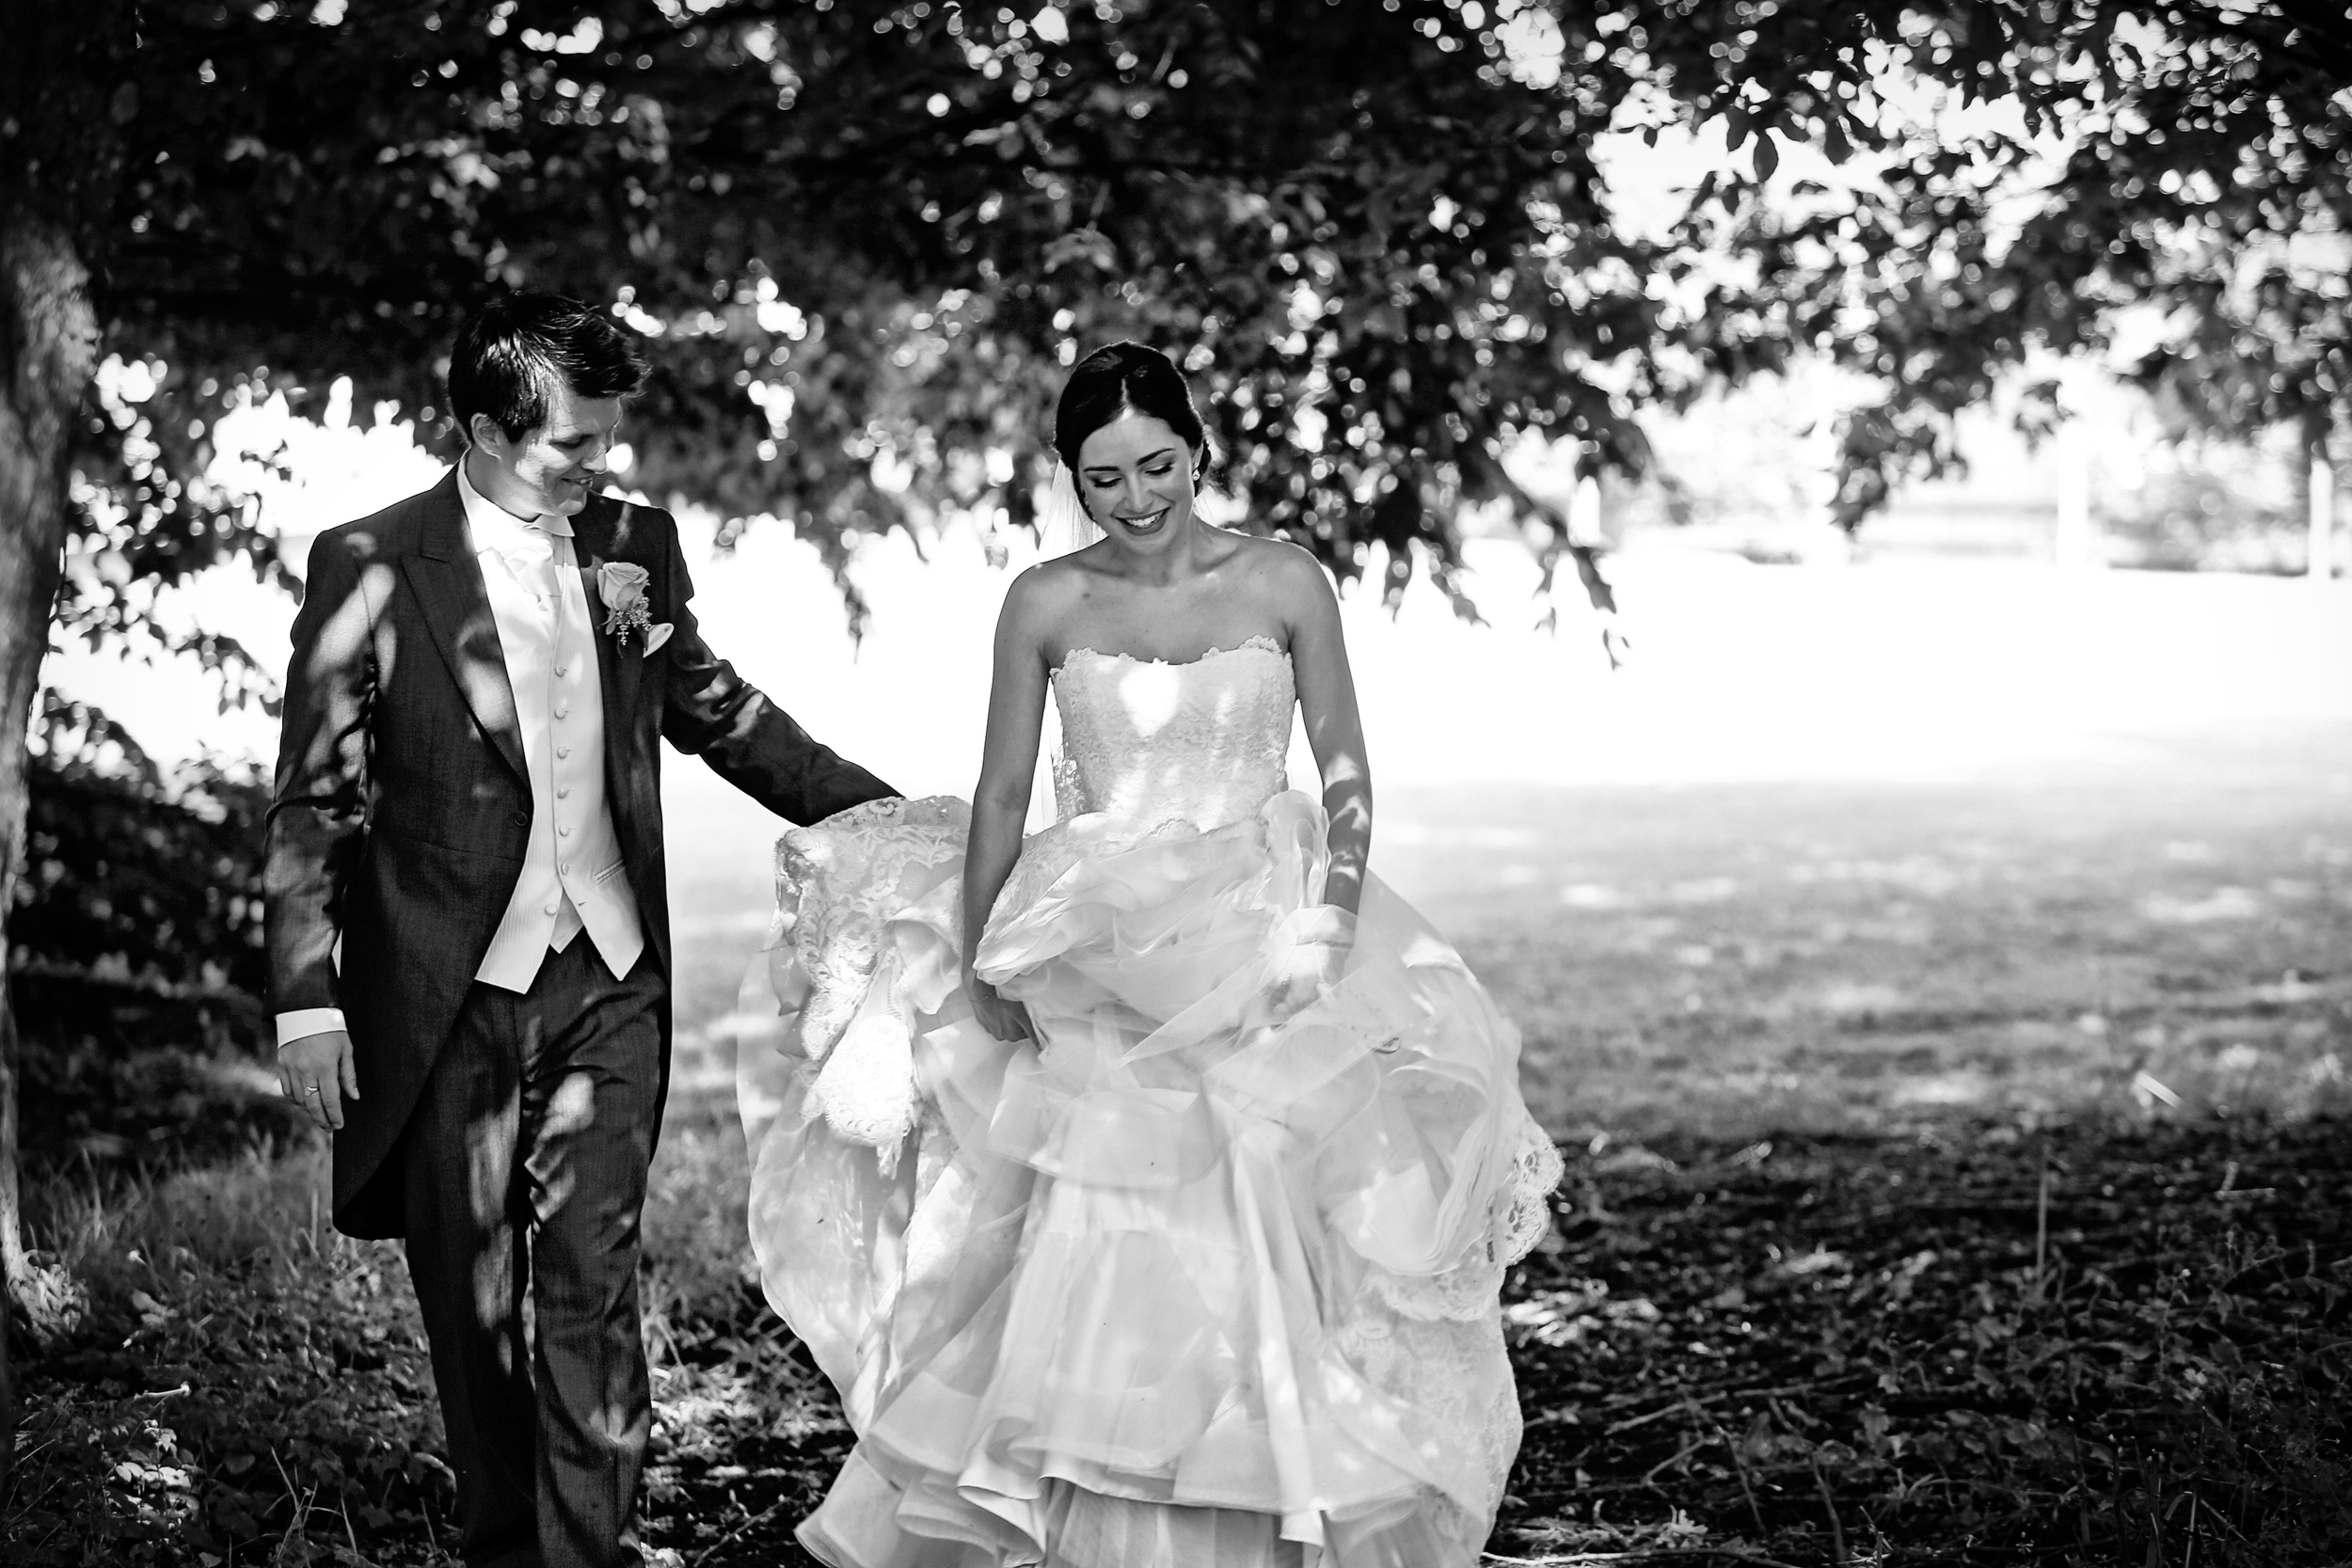 Bride and Groom (June 2014)